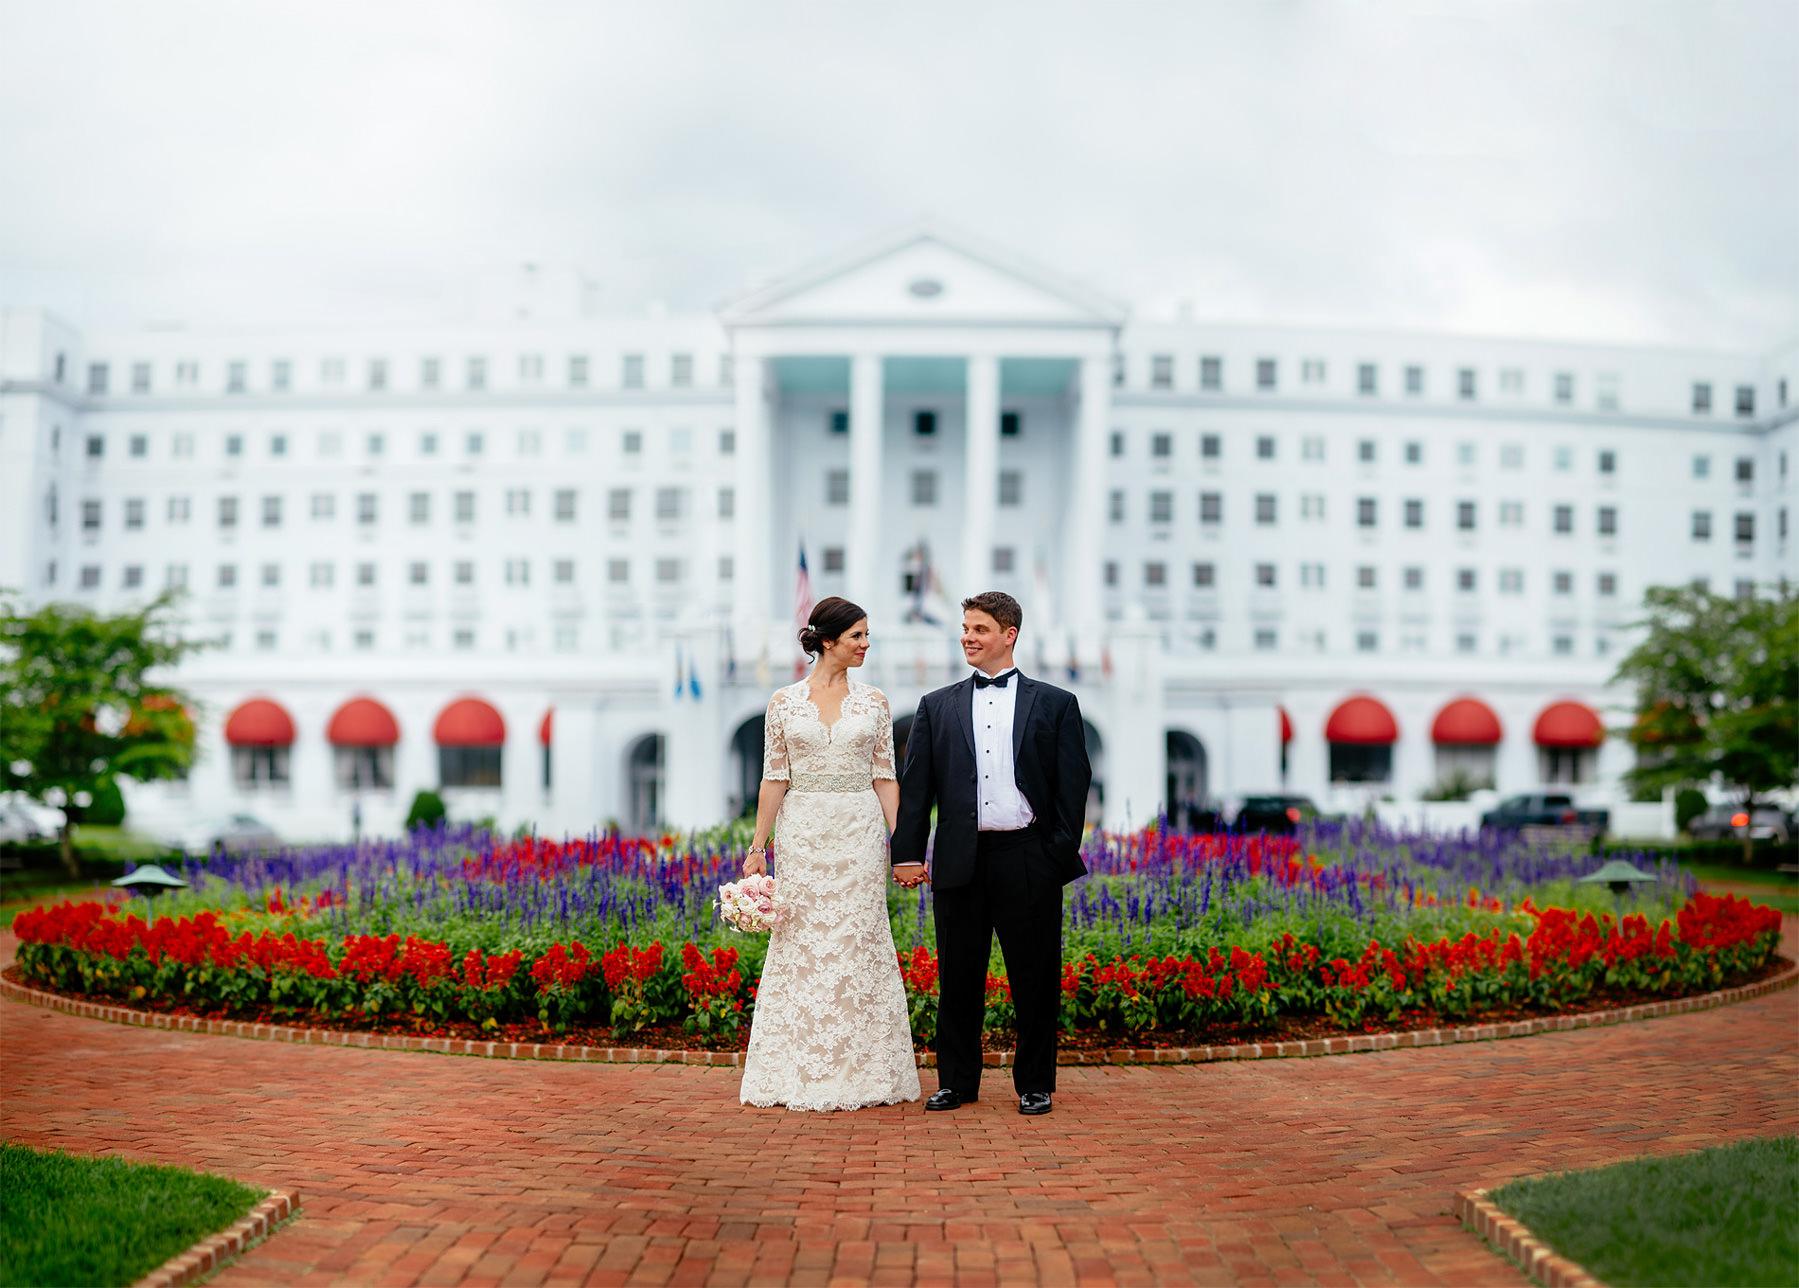 greenbrier resort weddings oberports